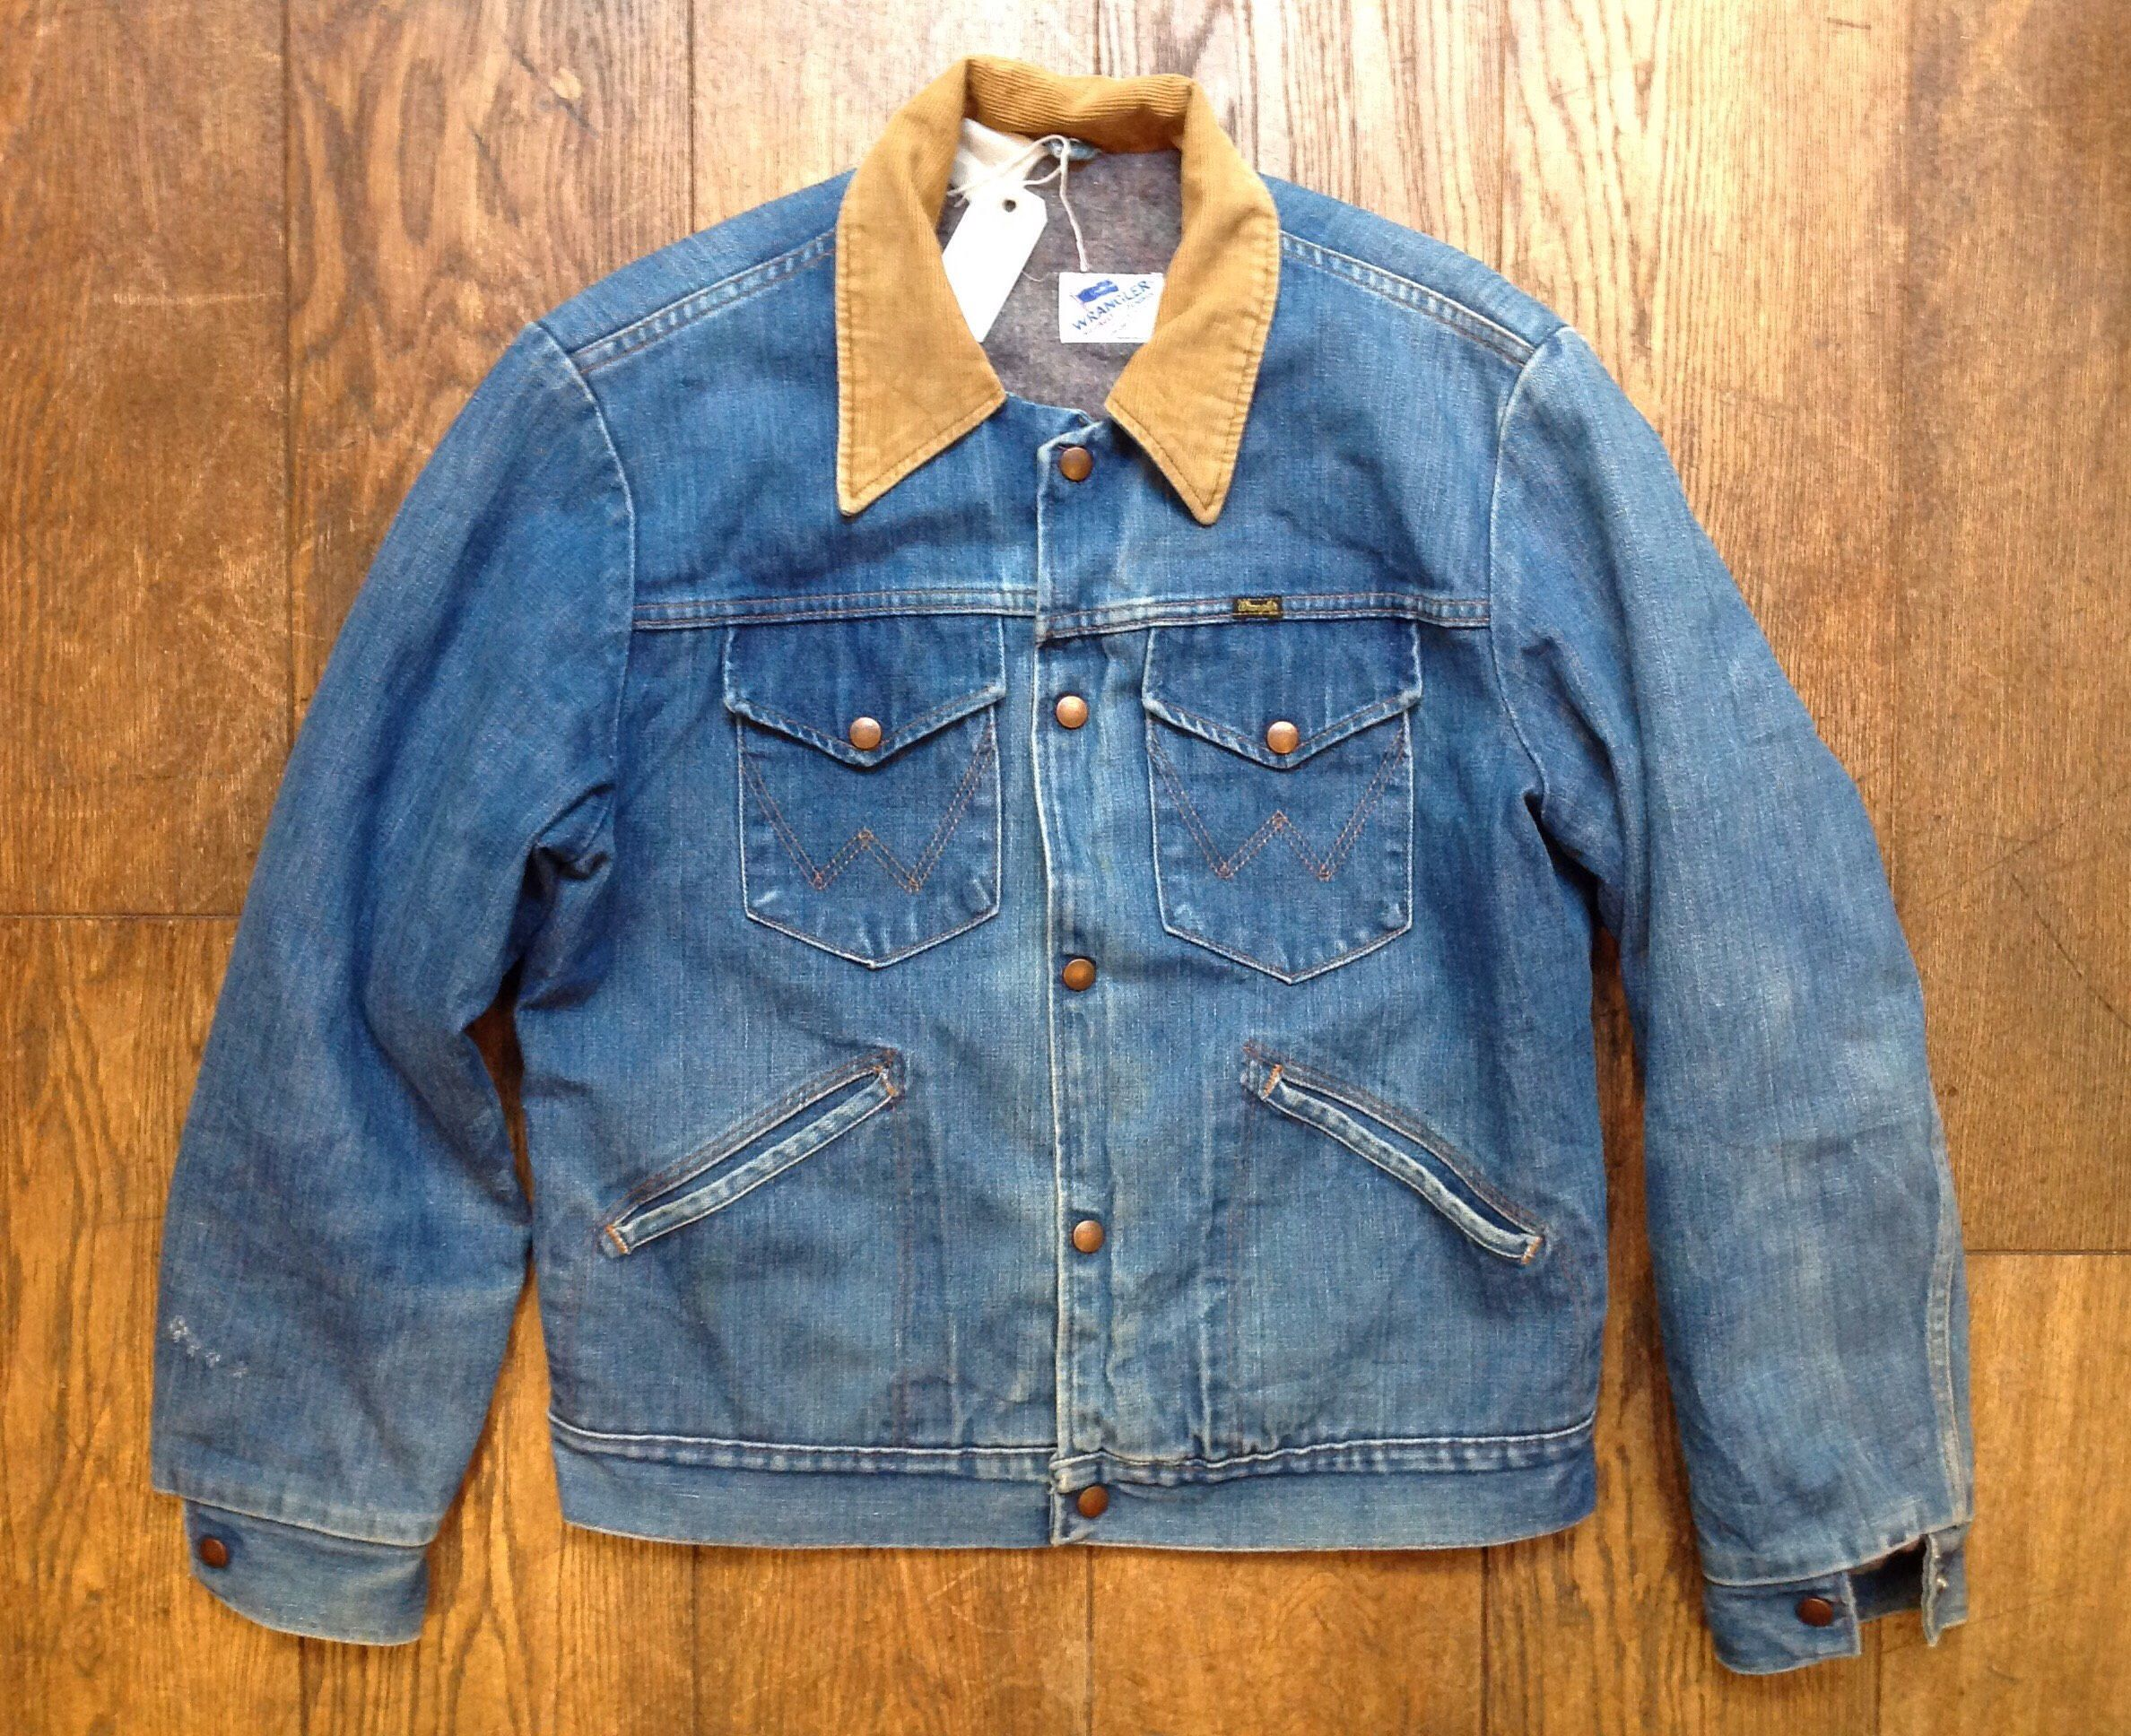 Vintage 1970s 70s Wrangler Denim Jacket Corduroy Collar Blanket Lined Western Cowboy 44 Chest Sanforized Made In Usa By Thedustb Menswear Denim Jacket Jackets